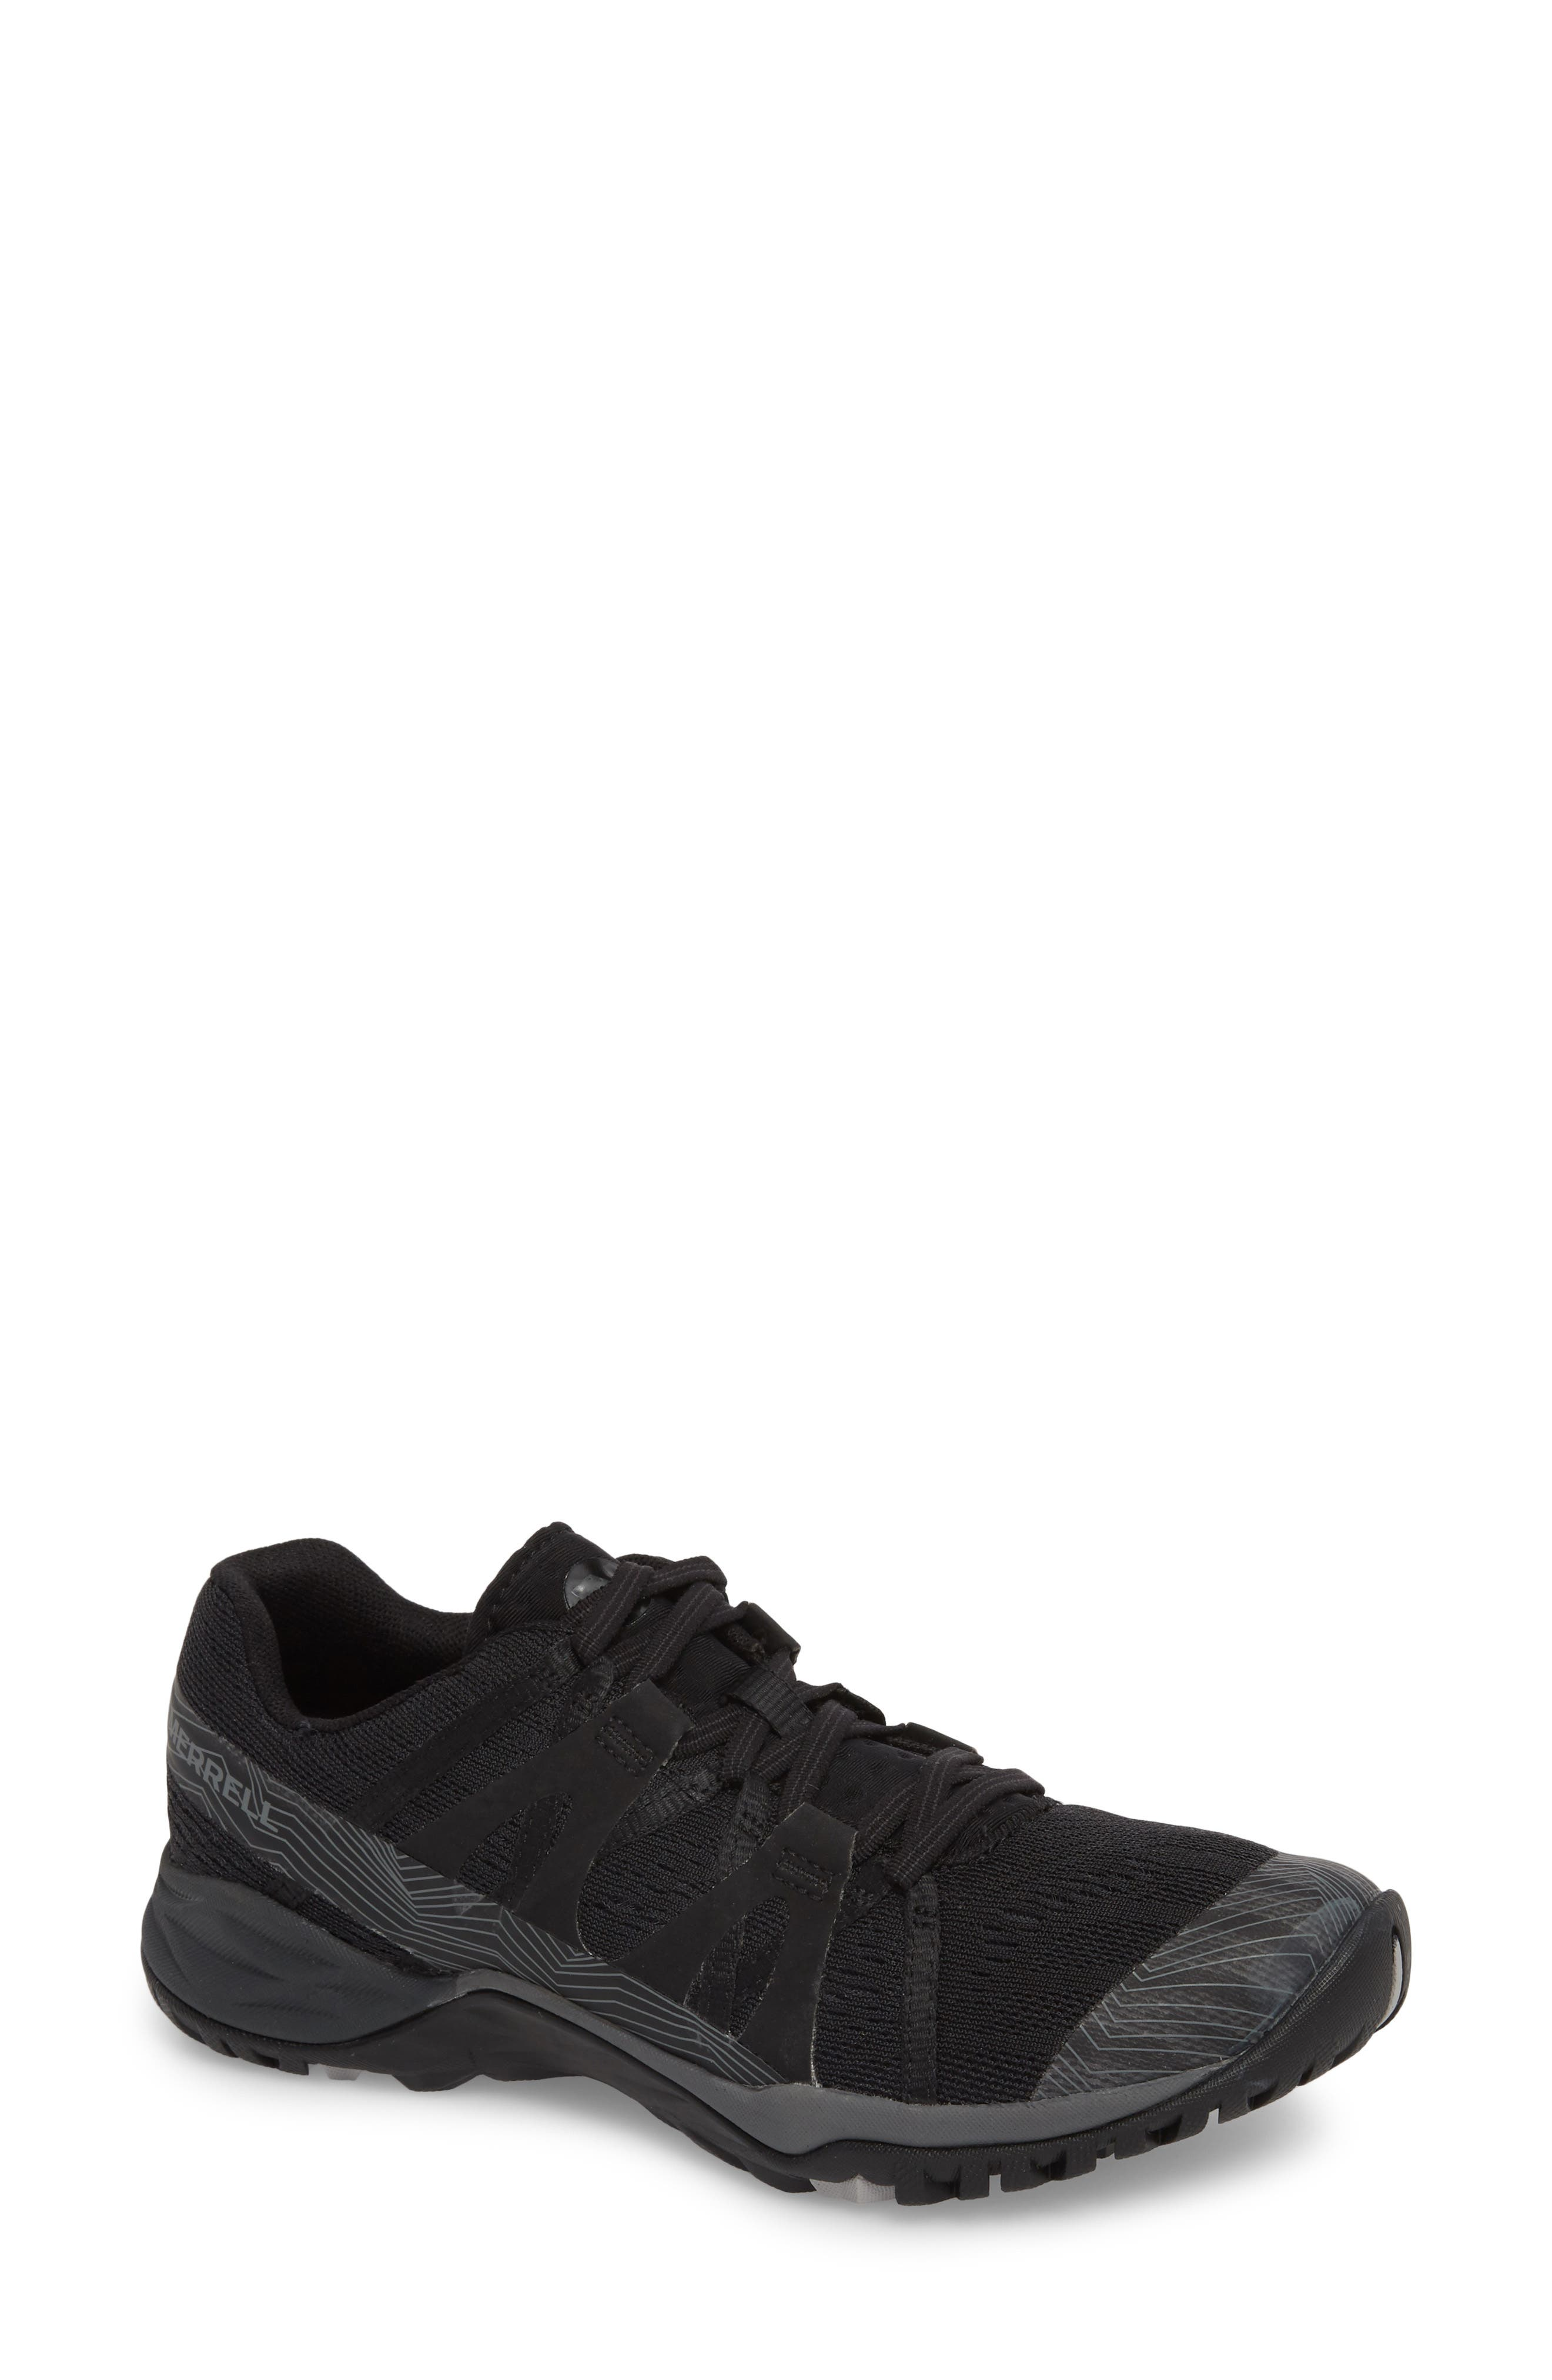 Siren Hex Sneaker,                             Main thumbnail 1, color,                             001